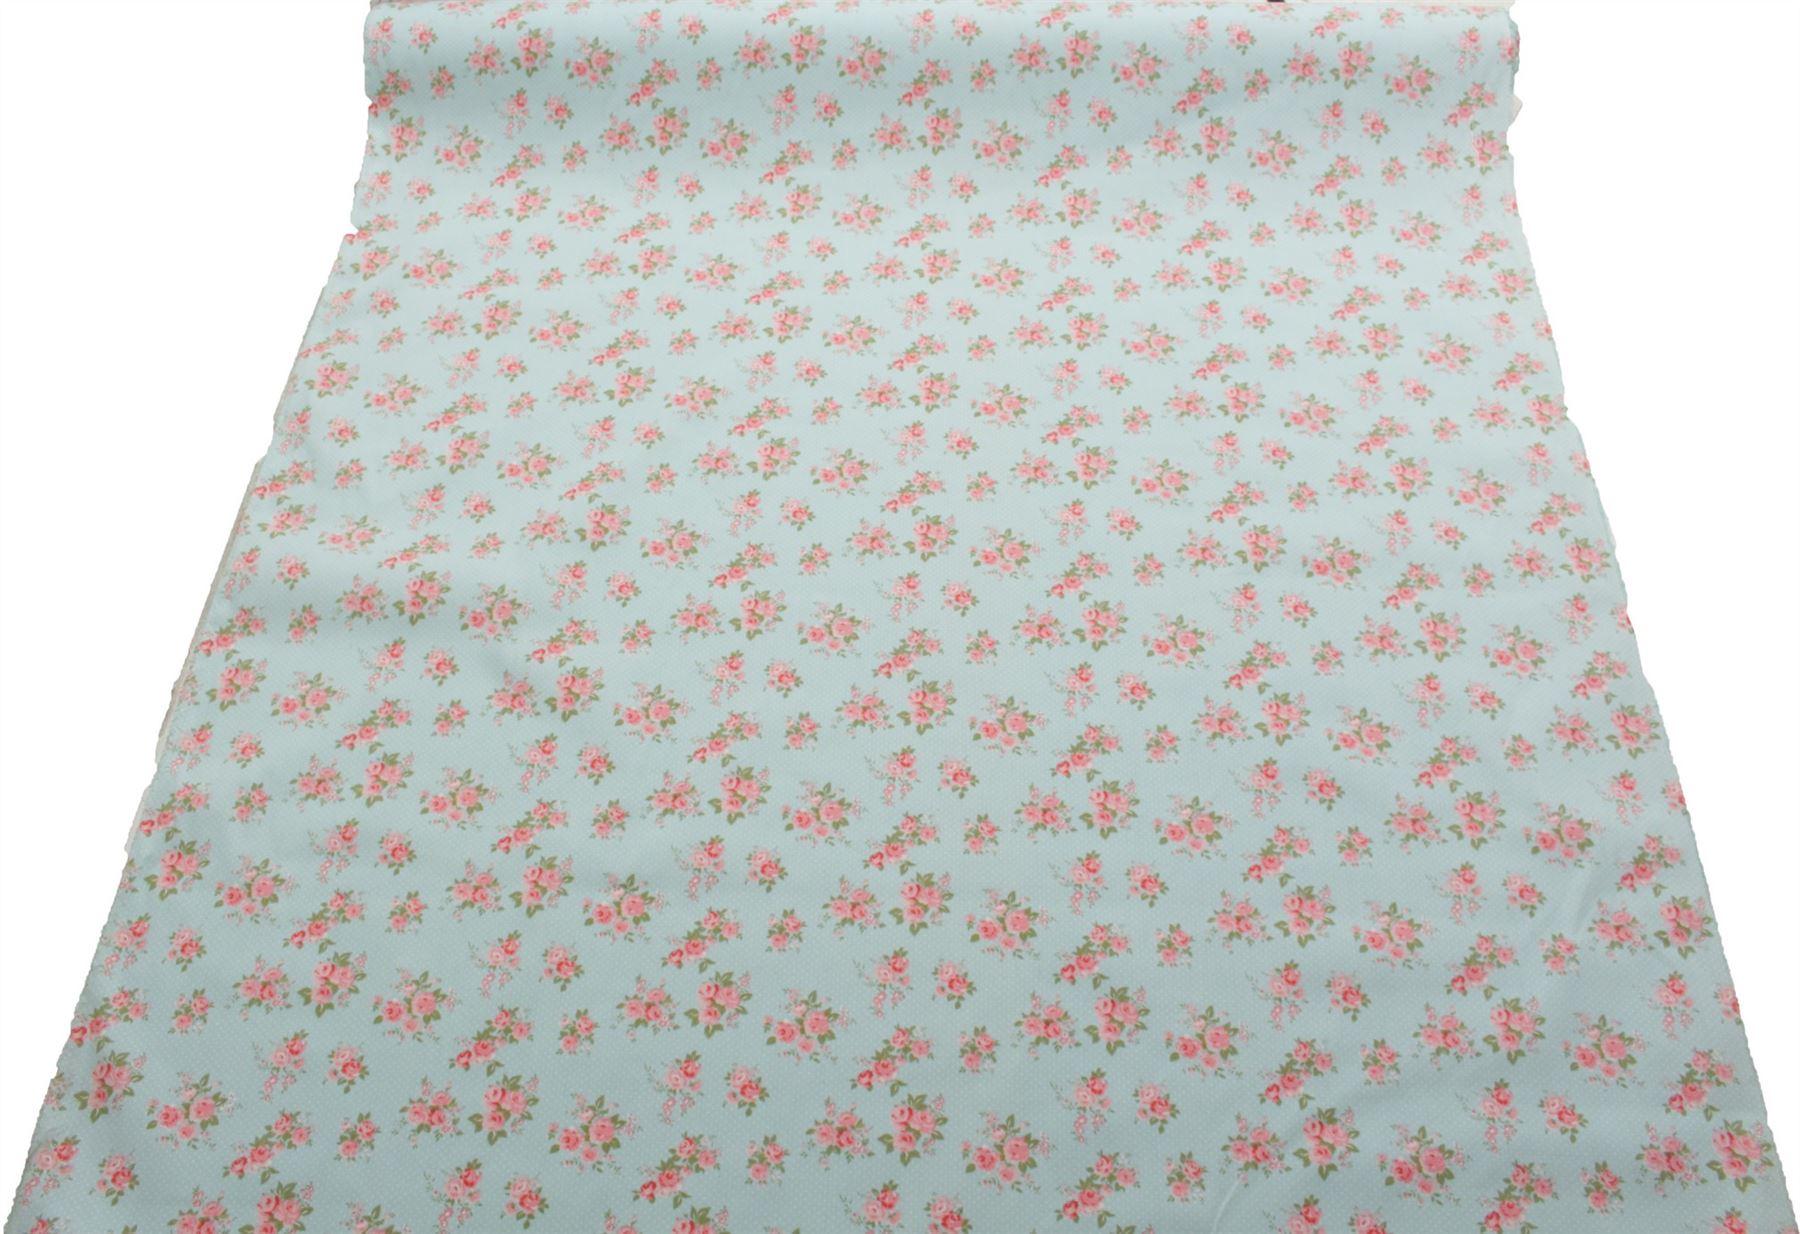 thumbnail 51 - 100% Heavy Cotton Panama Printed Childrens Curtain Cushion Upholstery Fabric